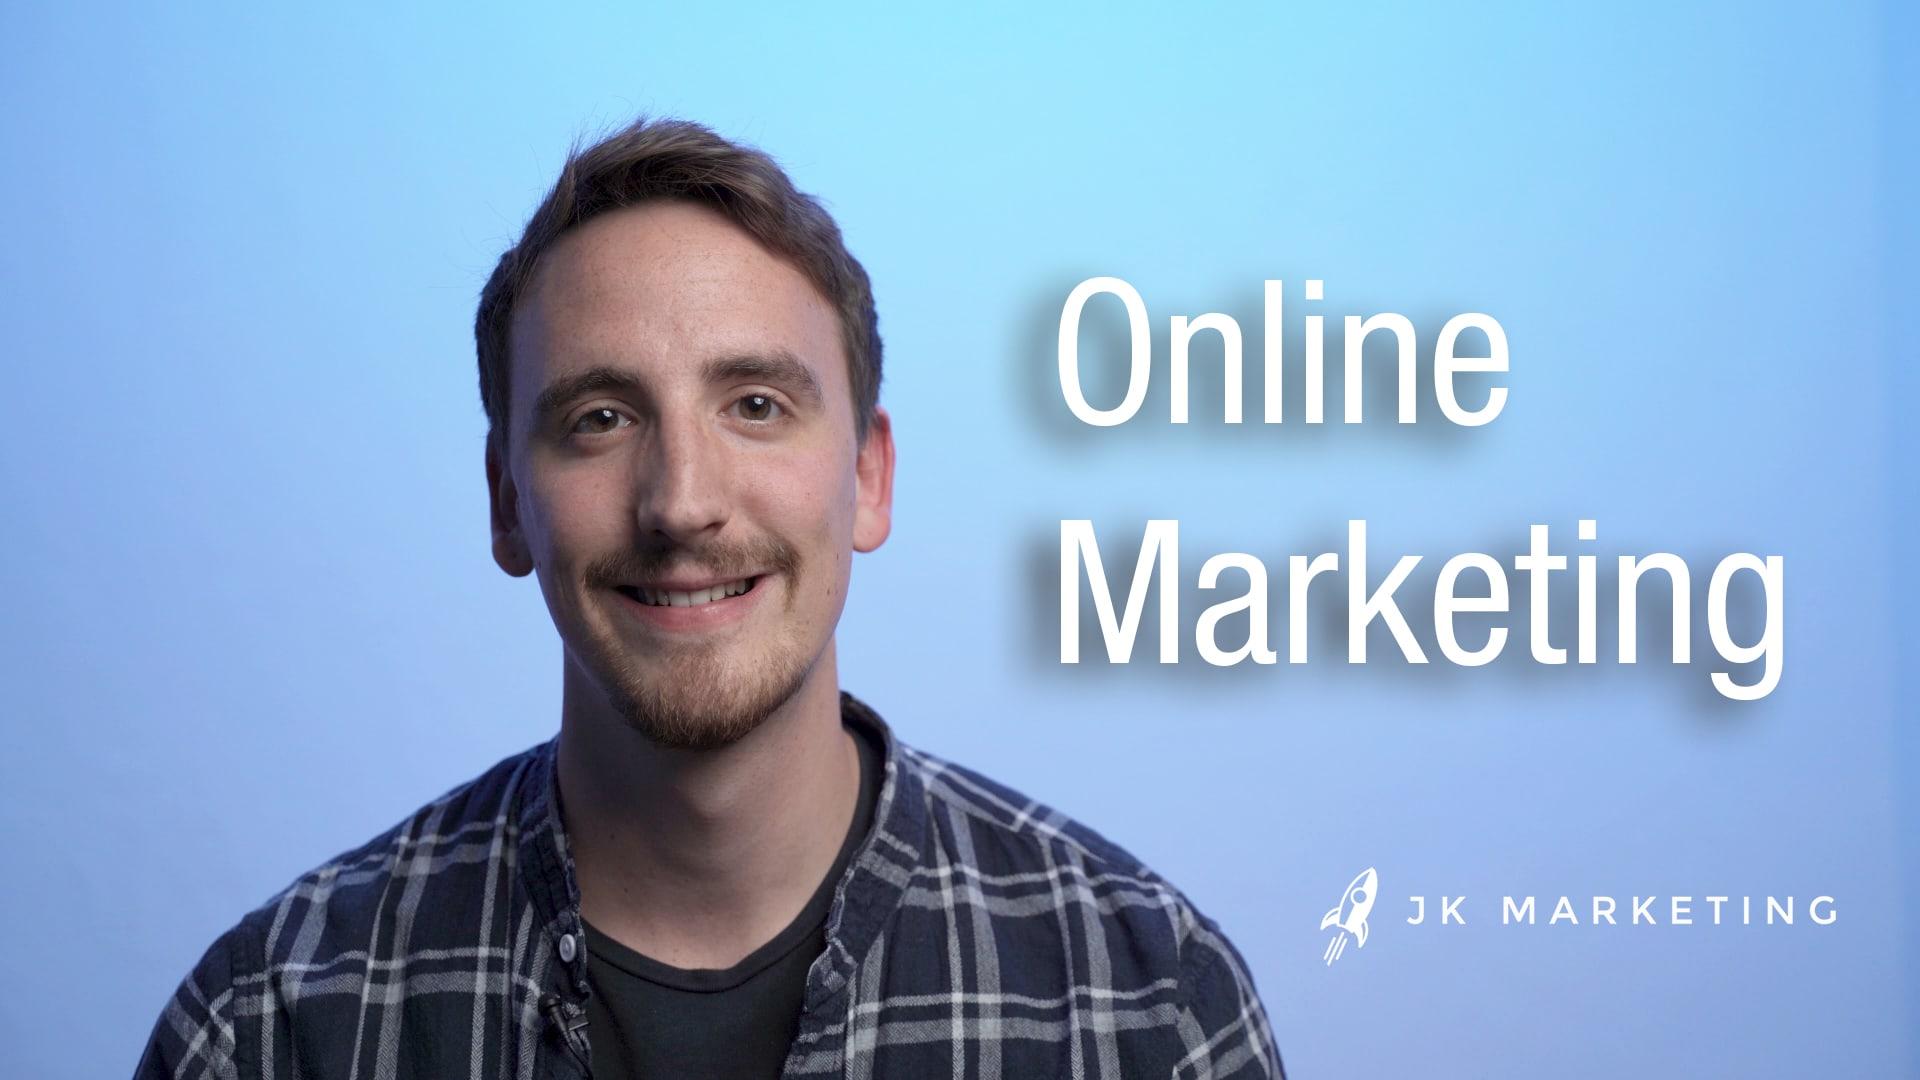 Thumbnail Online Marketing für den Rems-Murr-Kreis: Backnang, Winnenden, Waiblingen Fellbach Schorndorf von JK Marketing